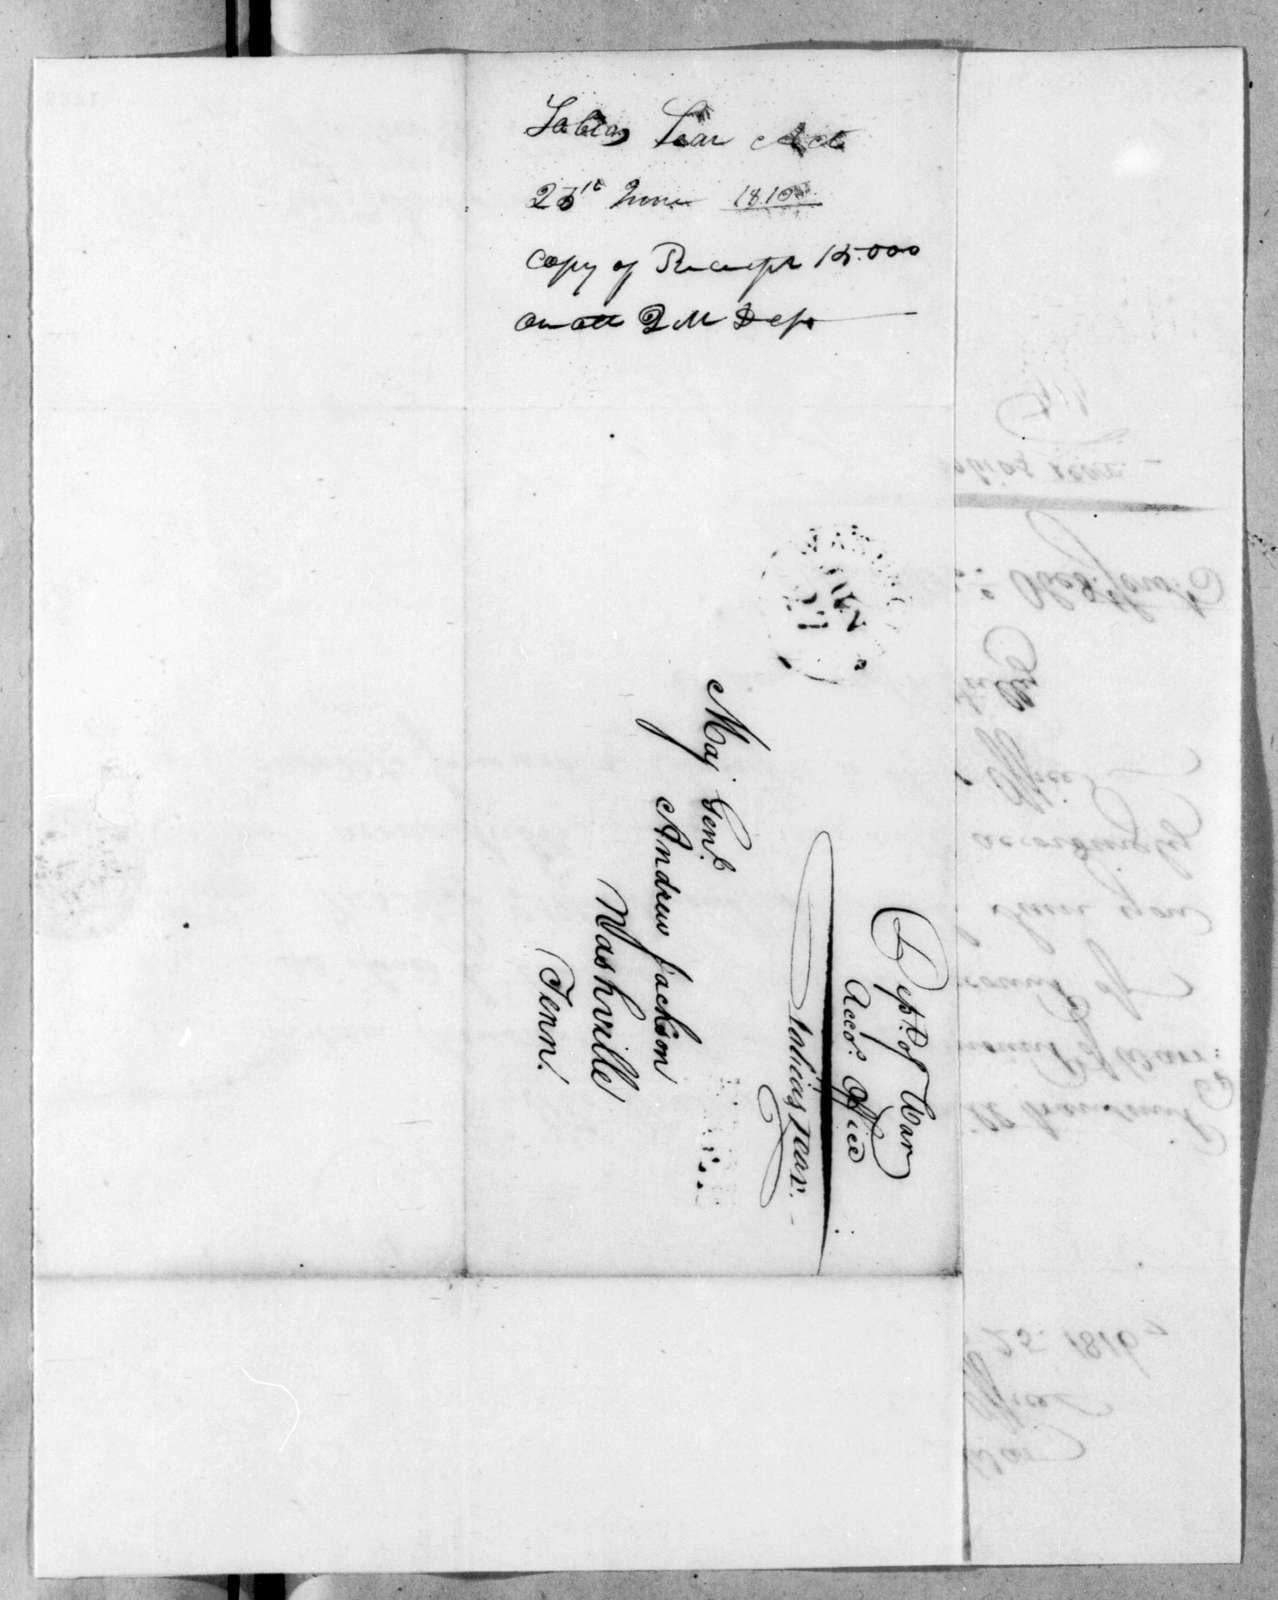 Tobias Lear to Andrew Jackson, June 25, 1816